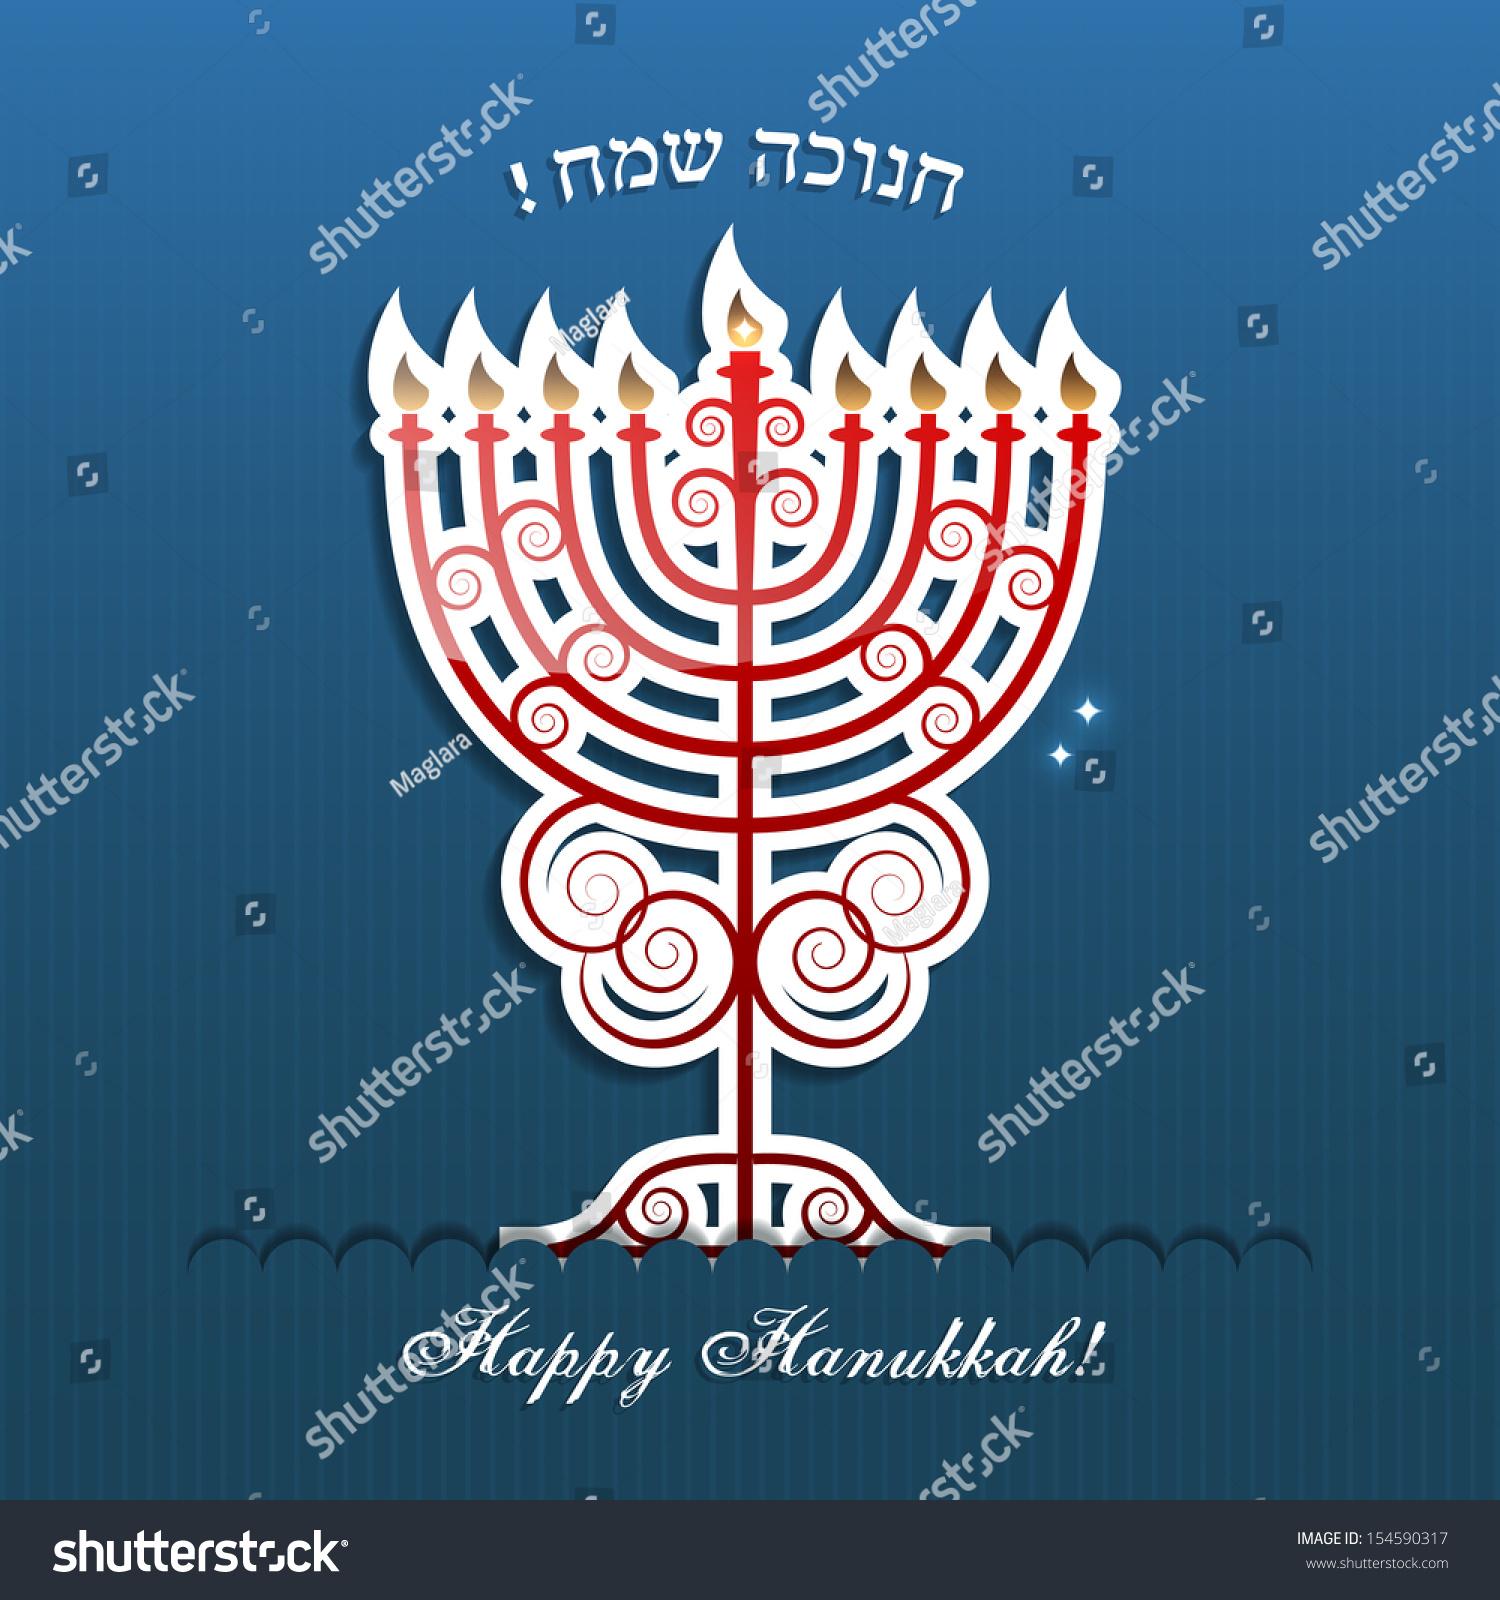 Jewish holiday hanukkah greeting card design stock vector royalty jewish holiday hanukkah greeting card design hebrew text happy hanukkah vector illustration m4hsunfo